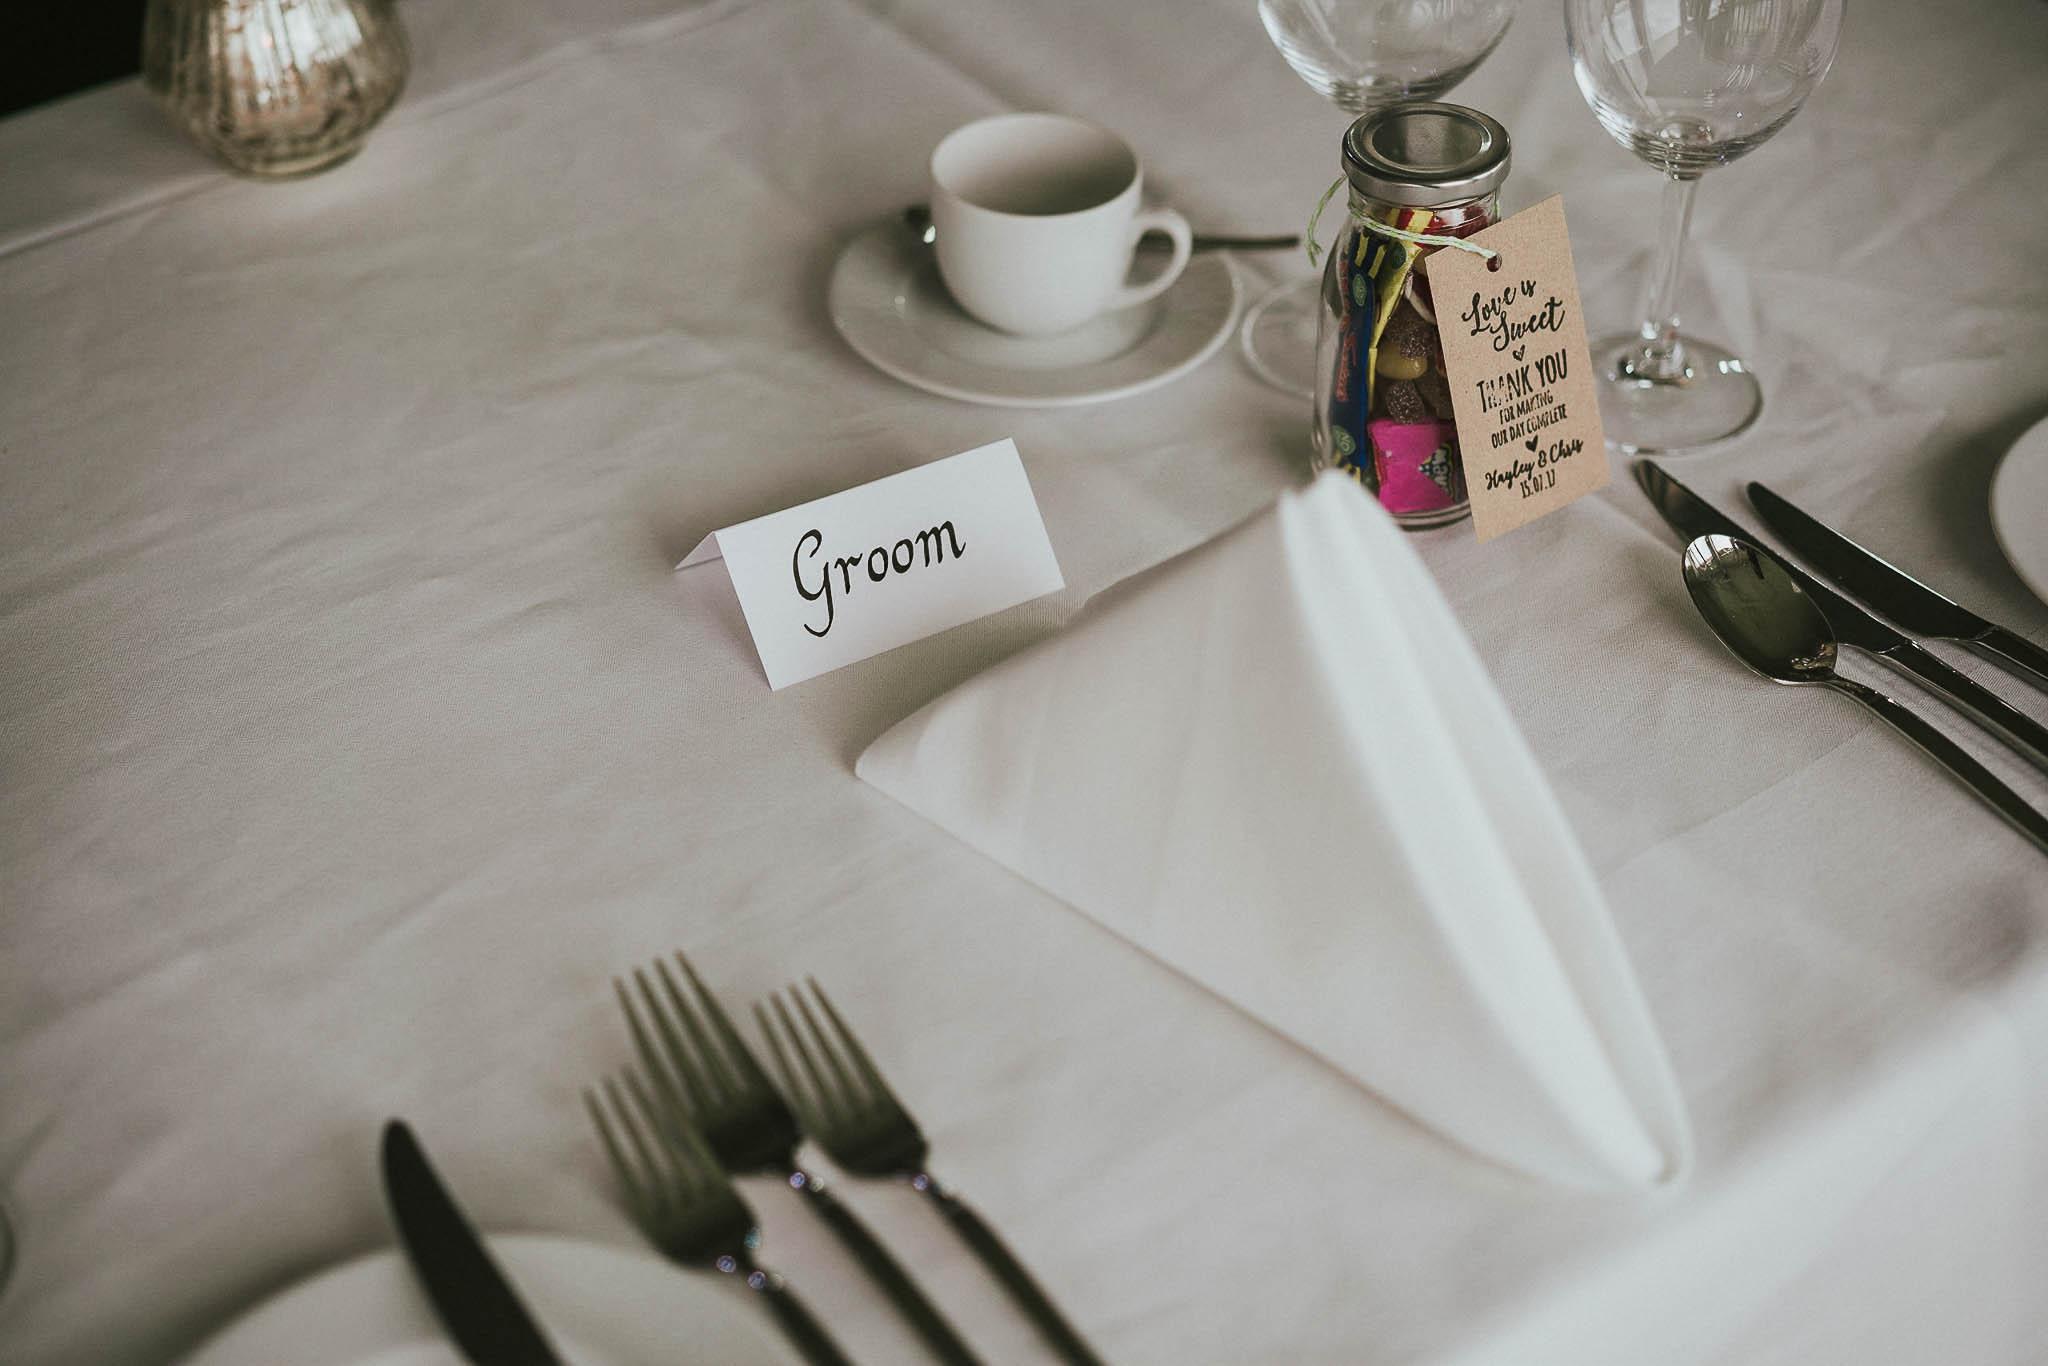 groom-name-tag